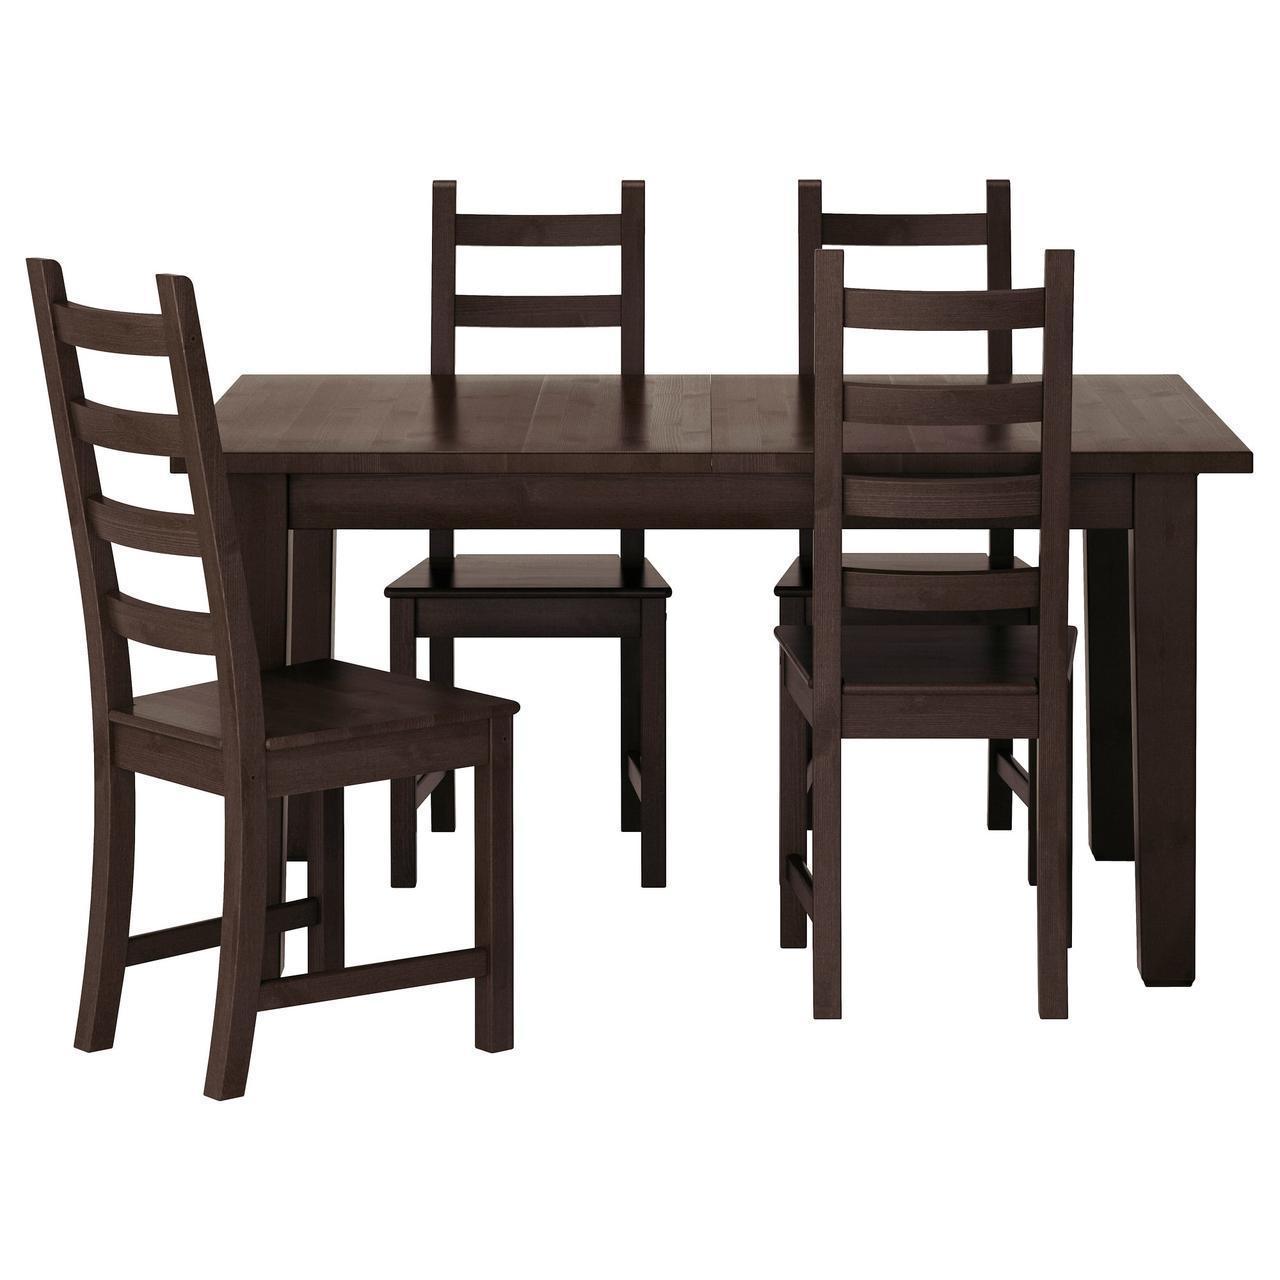 IKEA STORNAS/KAUSTBY Стол и 4 стула, коричневый-красный  (798.980.66)